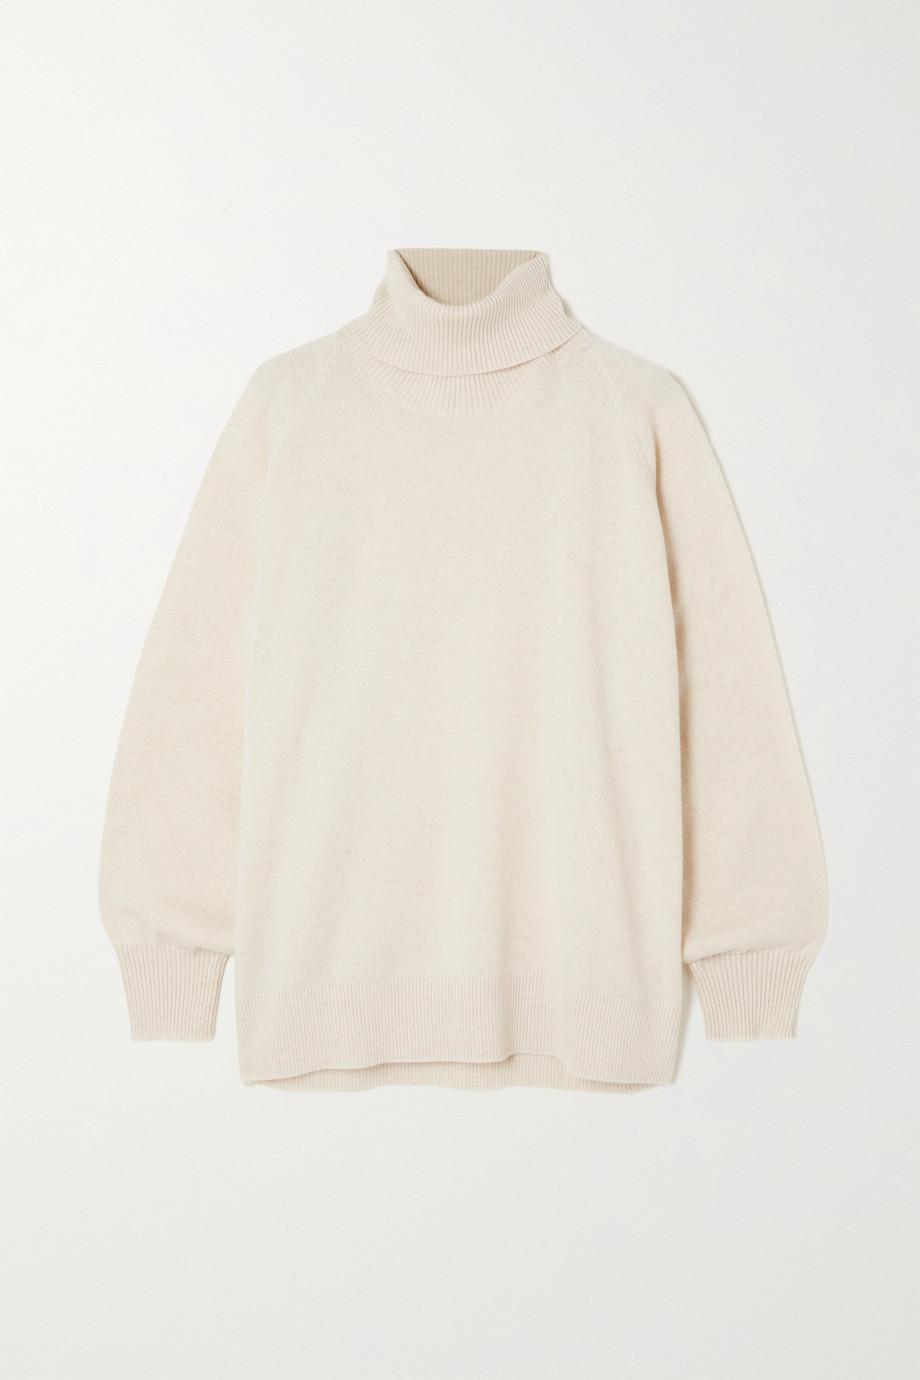 Rosetta Getty Cashmere turtleneck sweater